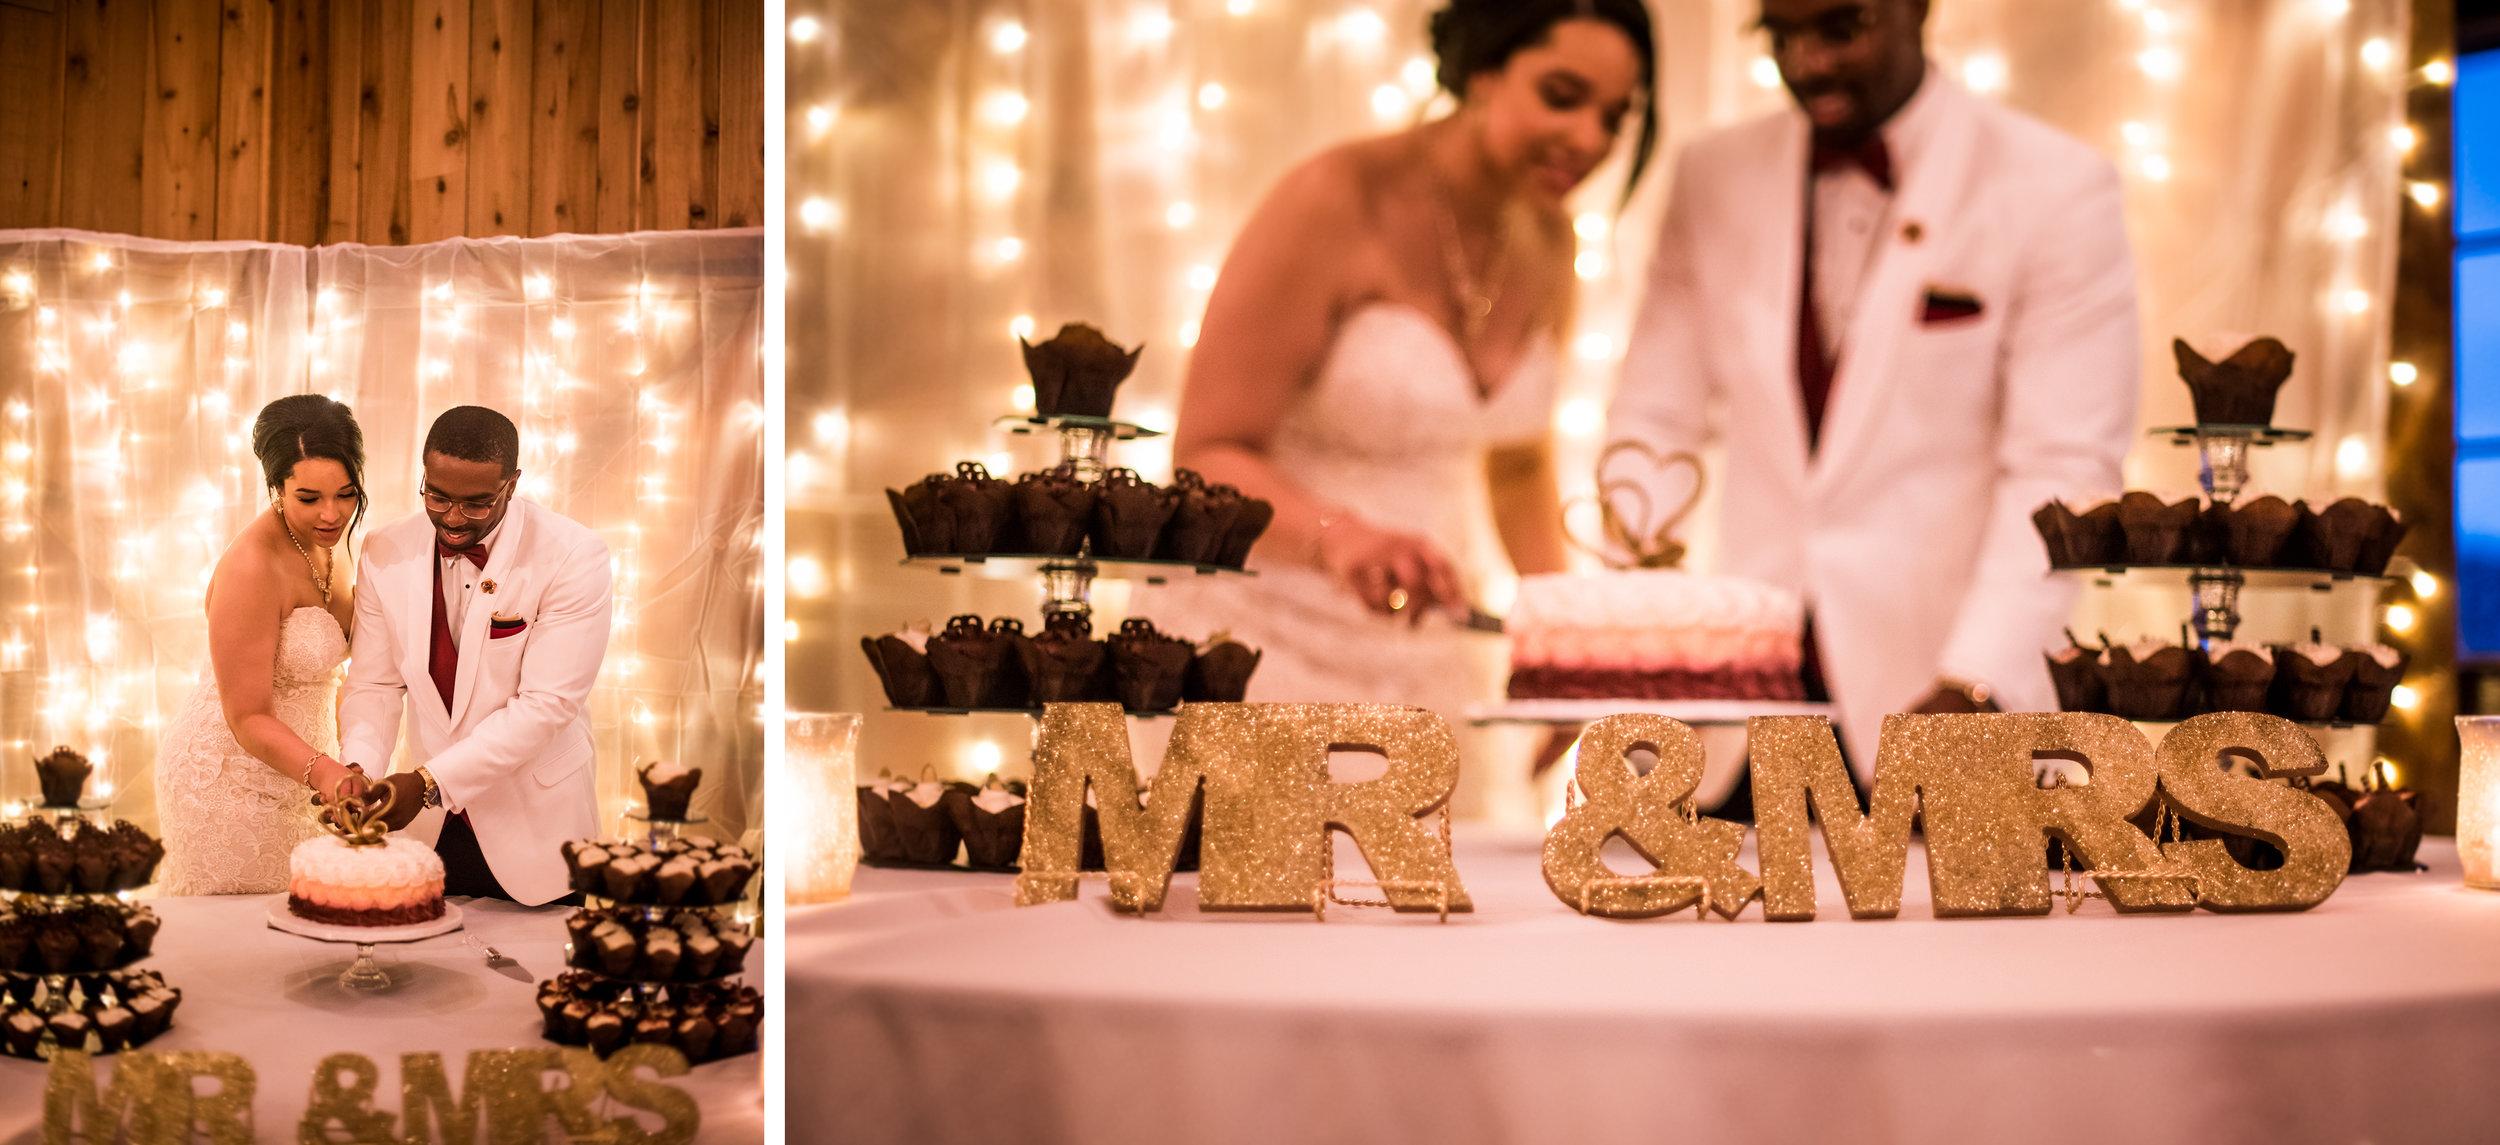 Burlington Iowa Wedding Midwest Photographer Melissa Cervantes _ Chantelle and Isaiah 2025.jpg